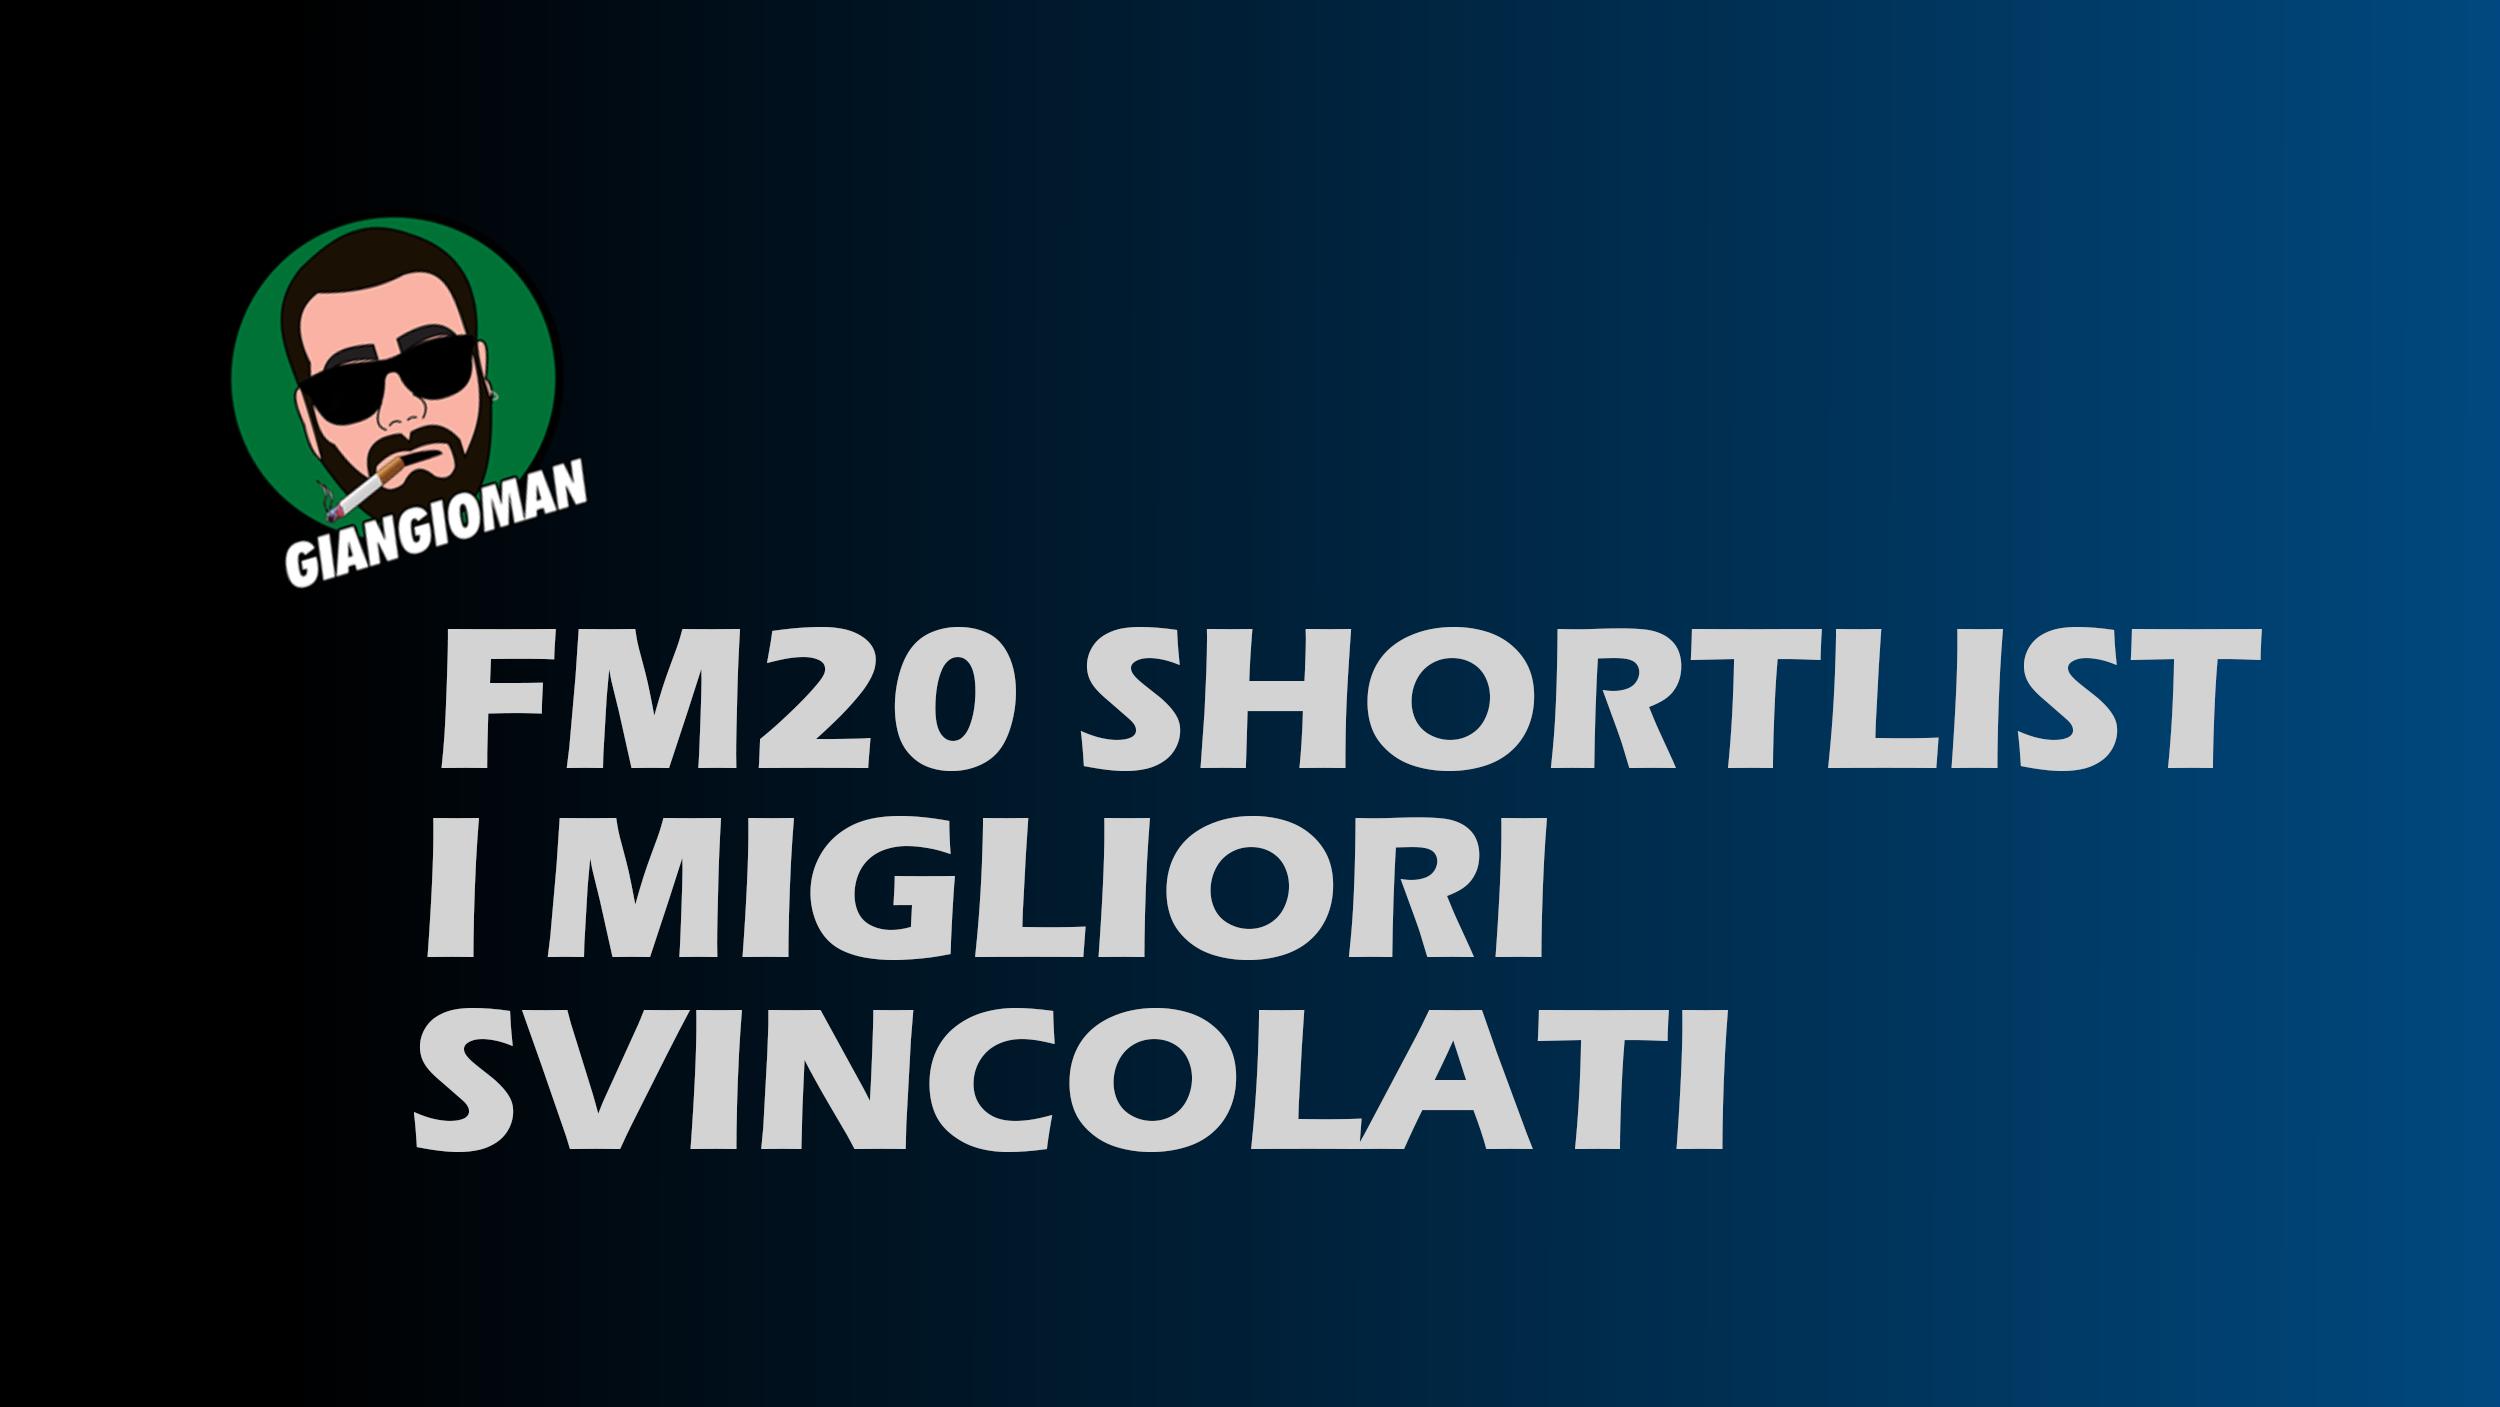 FM20 shortlist svincolsti